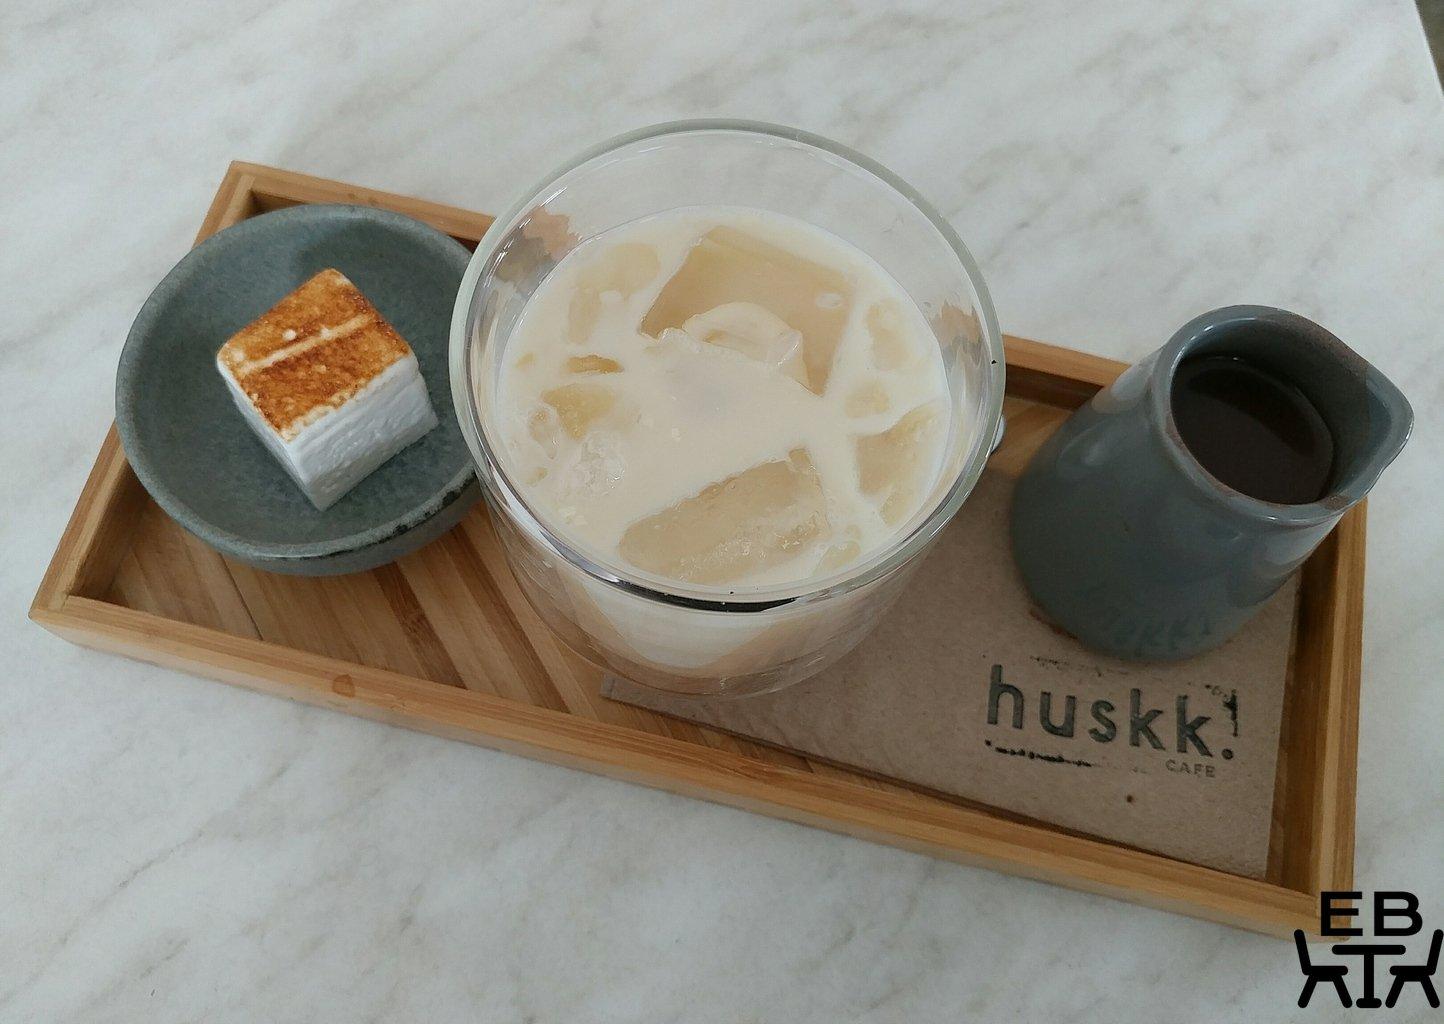 huskk cafe iced chocolate